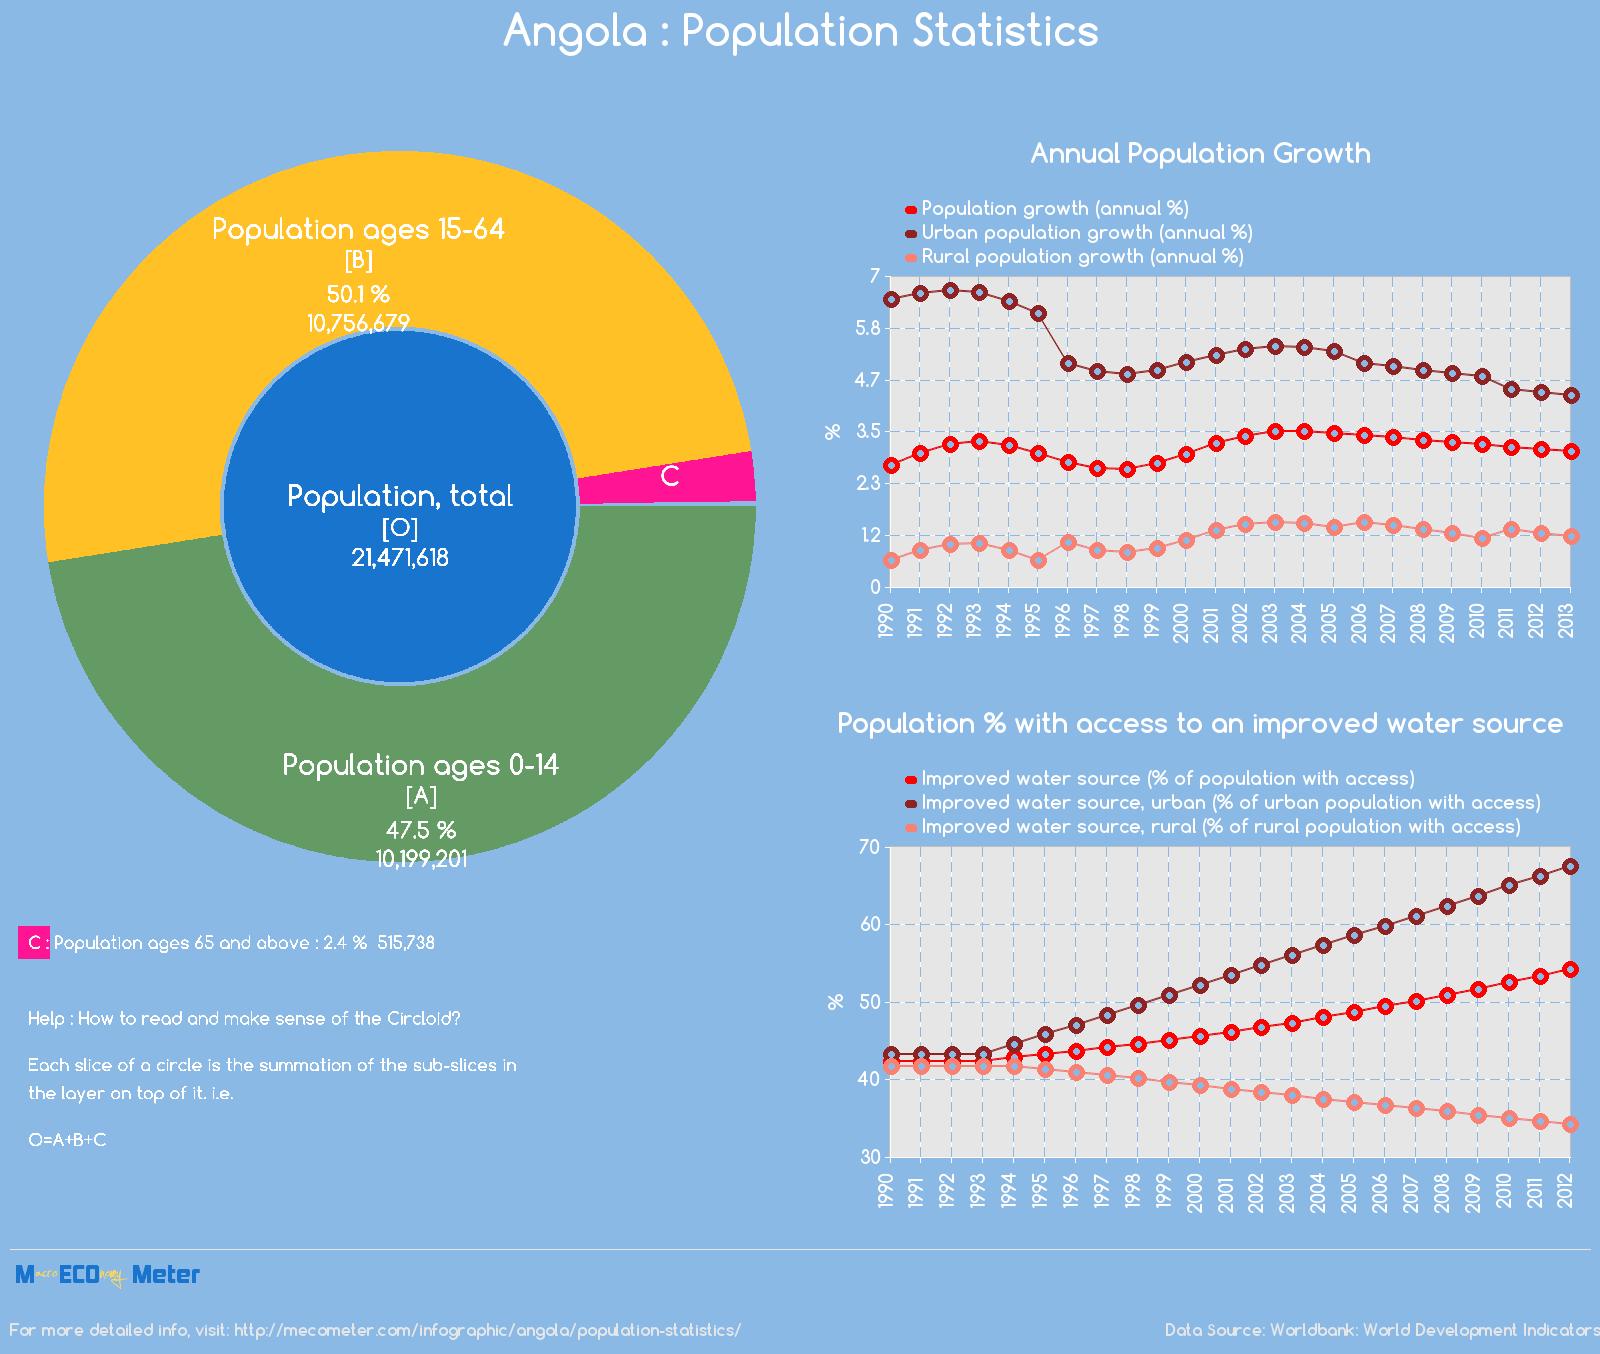 Angola : Population Statistics